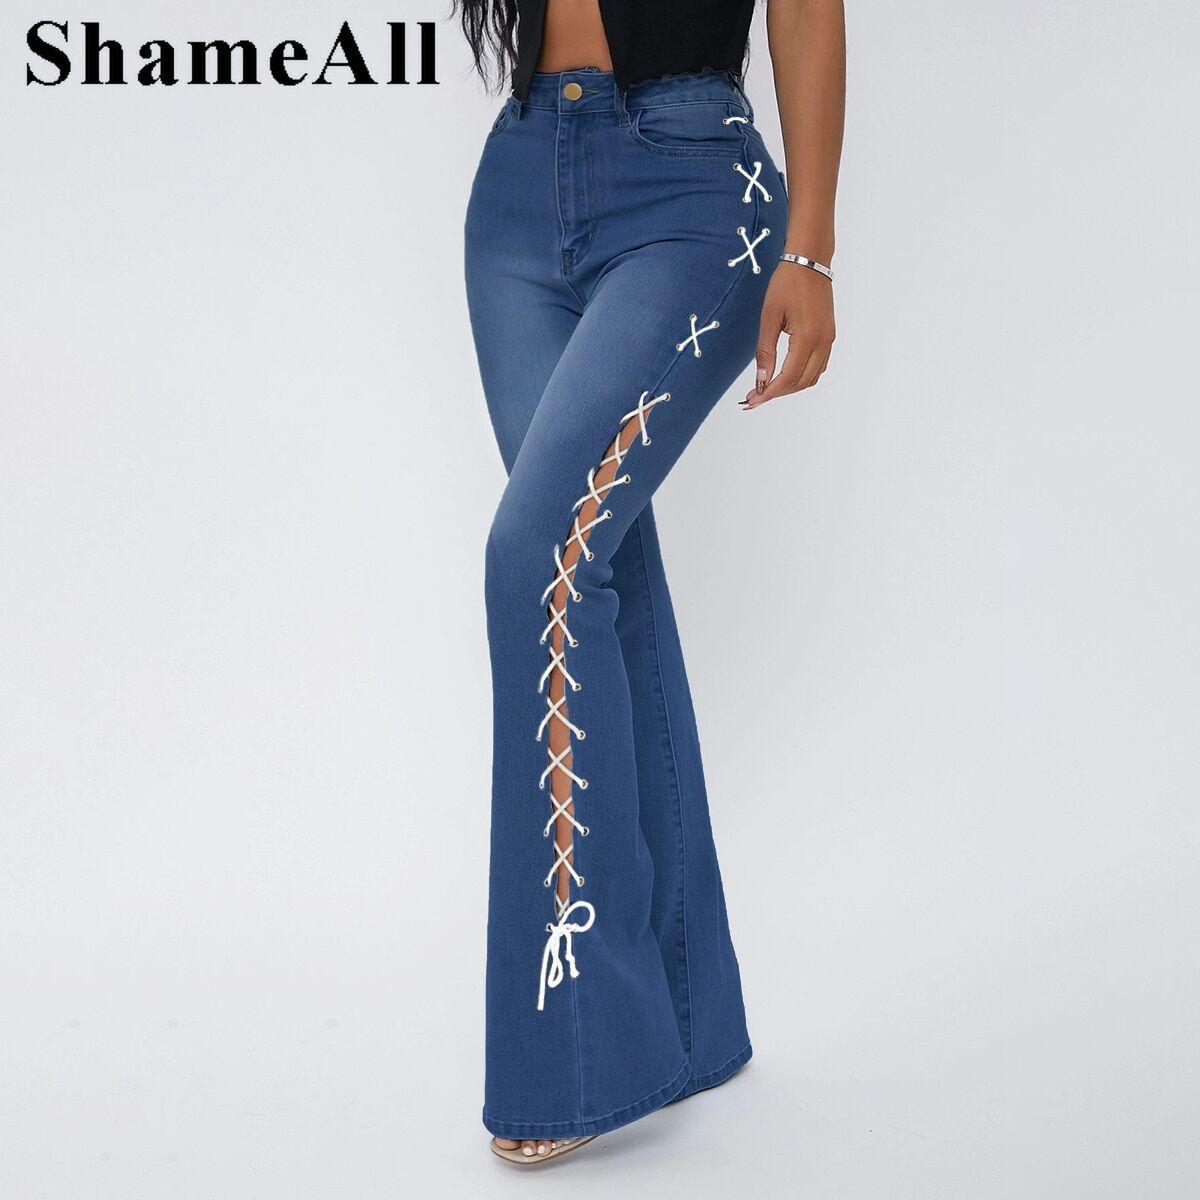 AliExpress Jean Stretch évasé taille haute 5xl, Streetwear Vintage, pantalon en Denim Goth Y2k